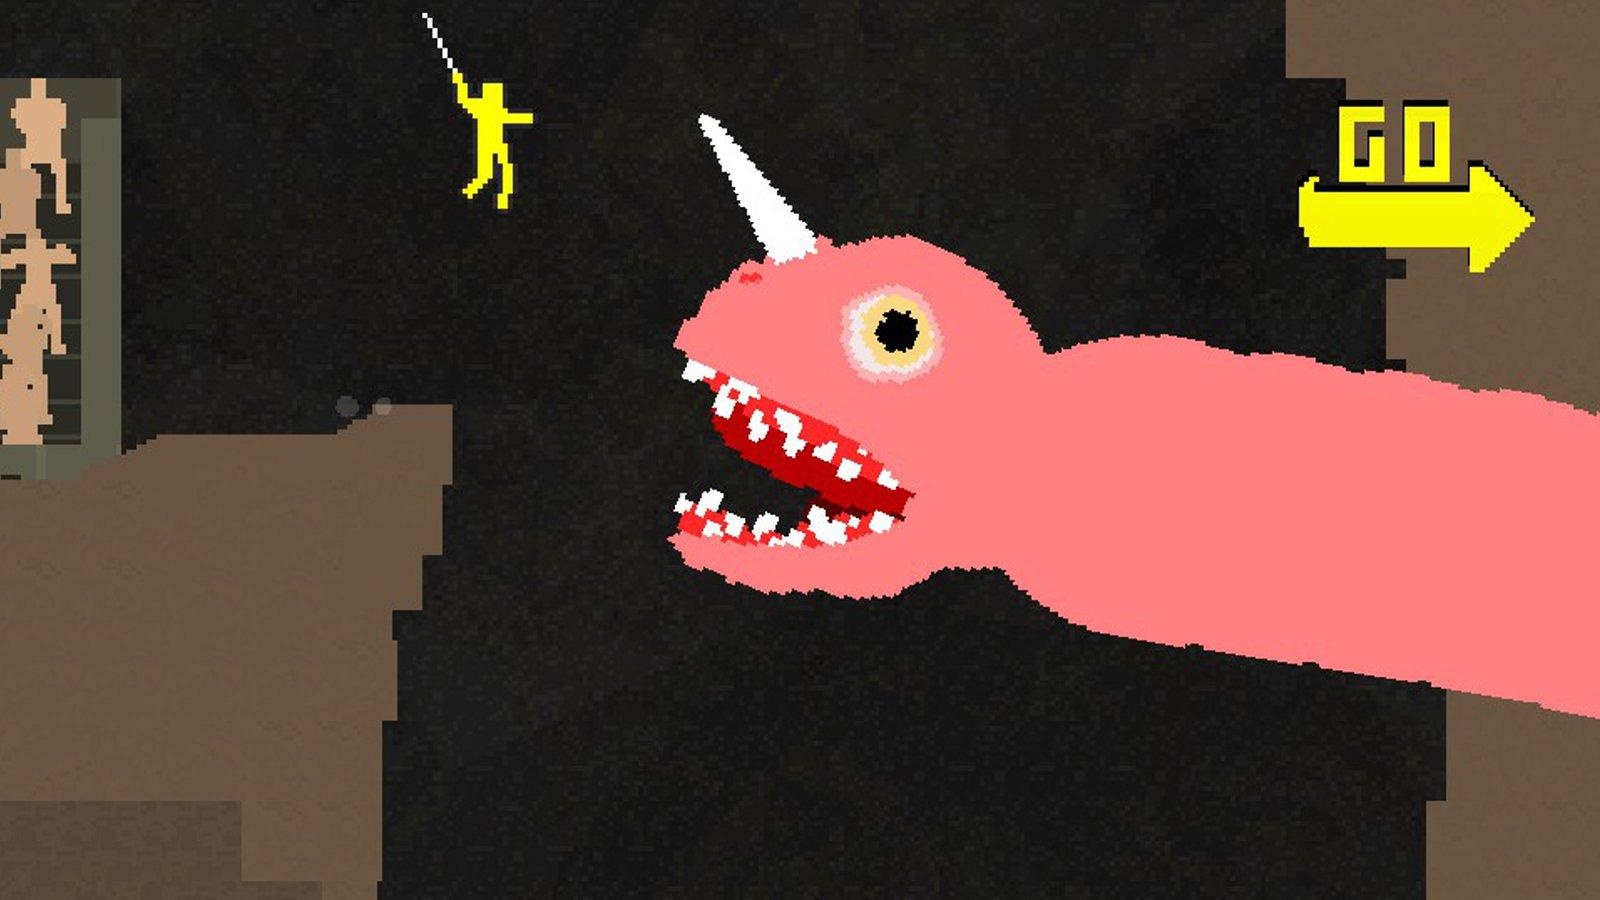 2d video game art styles